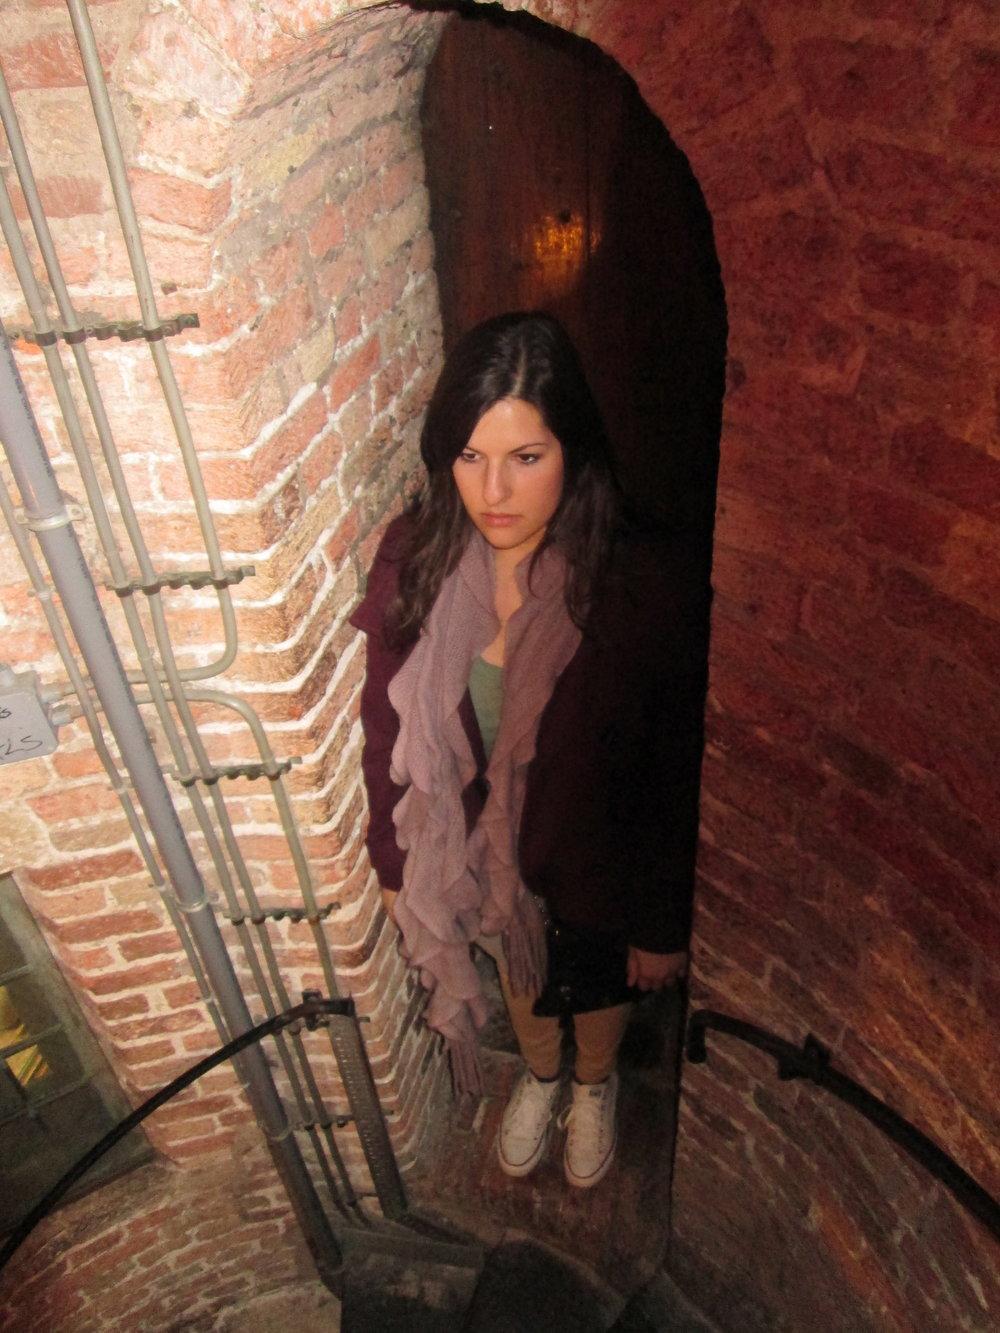 Stairwell creepin'